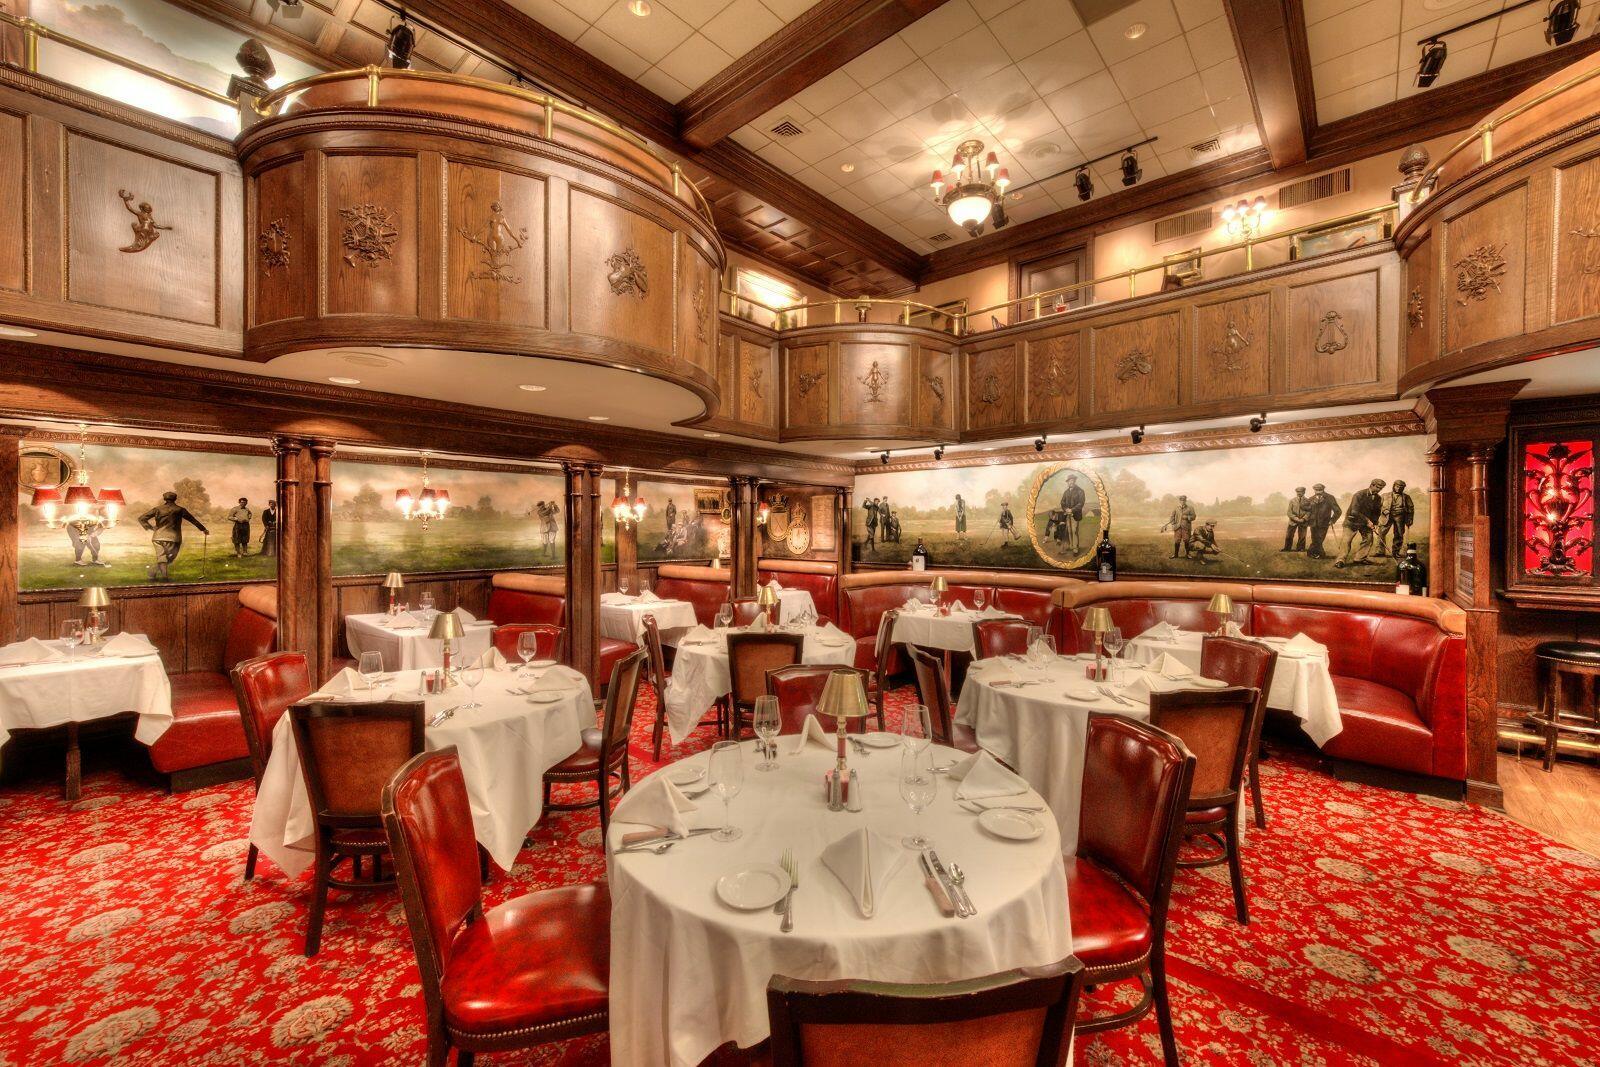 Interior of Rod's Steakhouse